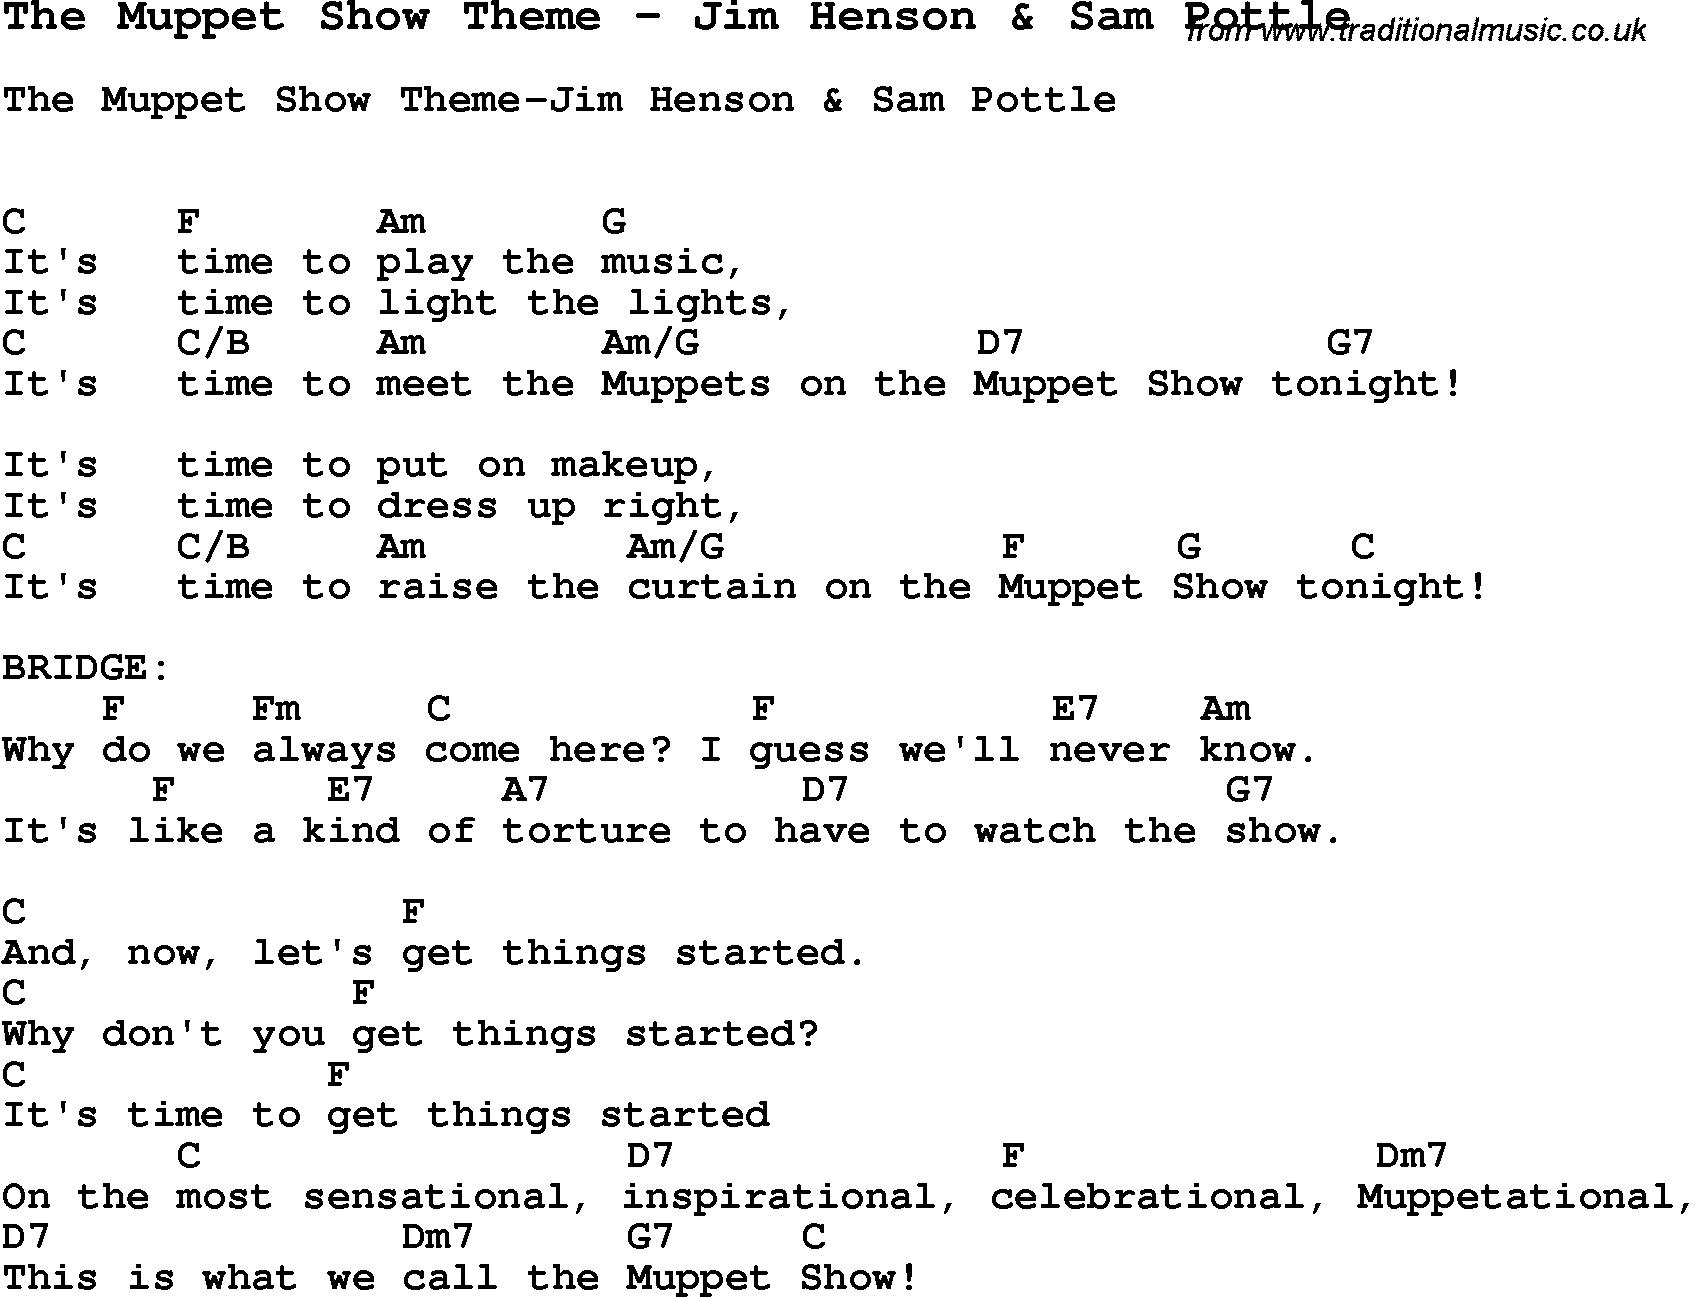 Song the muppet show theme by jim henson sam pottle with lyrics song the muppet show theme by jim henson sam pottle song lyric for vocal performance plus accompaniment chords for ukulele guitar banjo etc hexwebz Choice Image